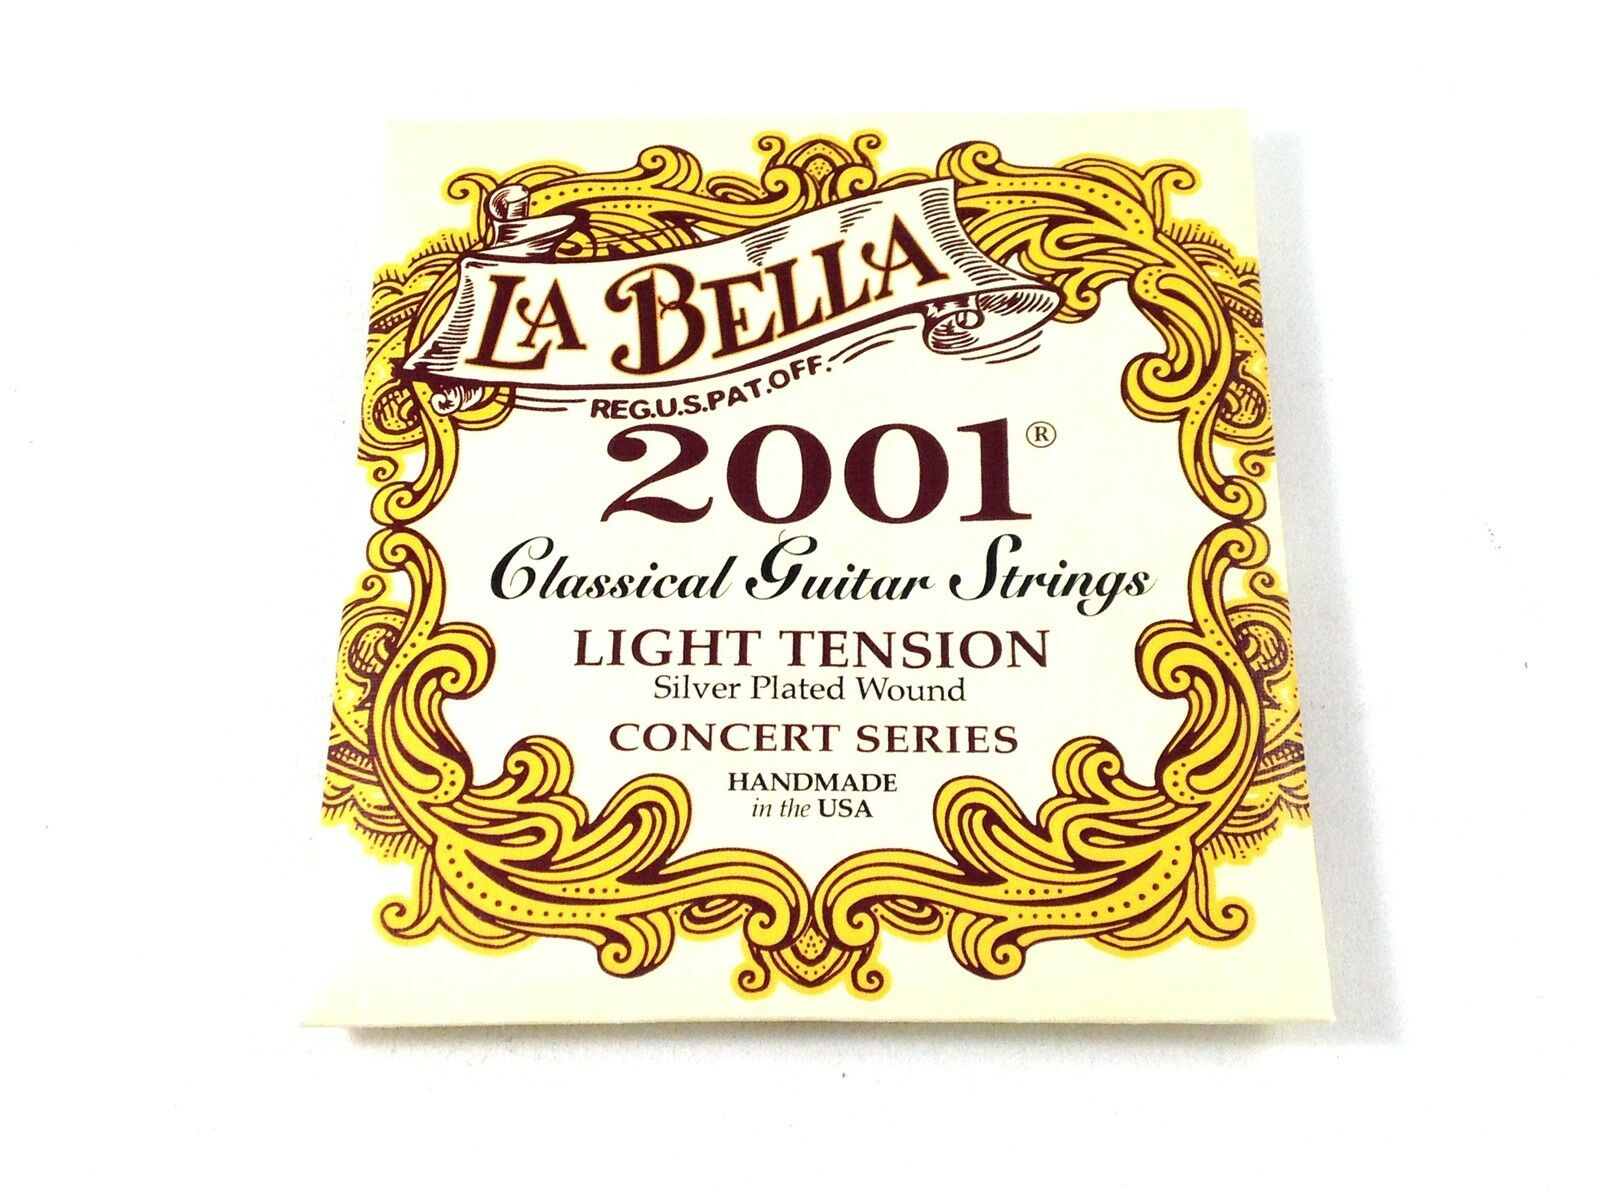 la bella guitar strings light tension silver plated wound classical 2001 ebay. Black Bedroom Furniture Sets. Home Design Ideas